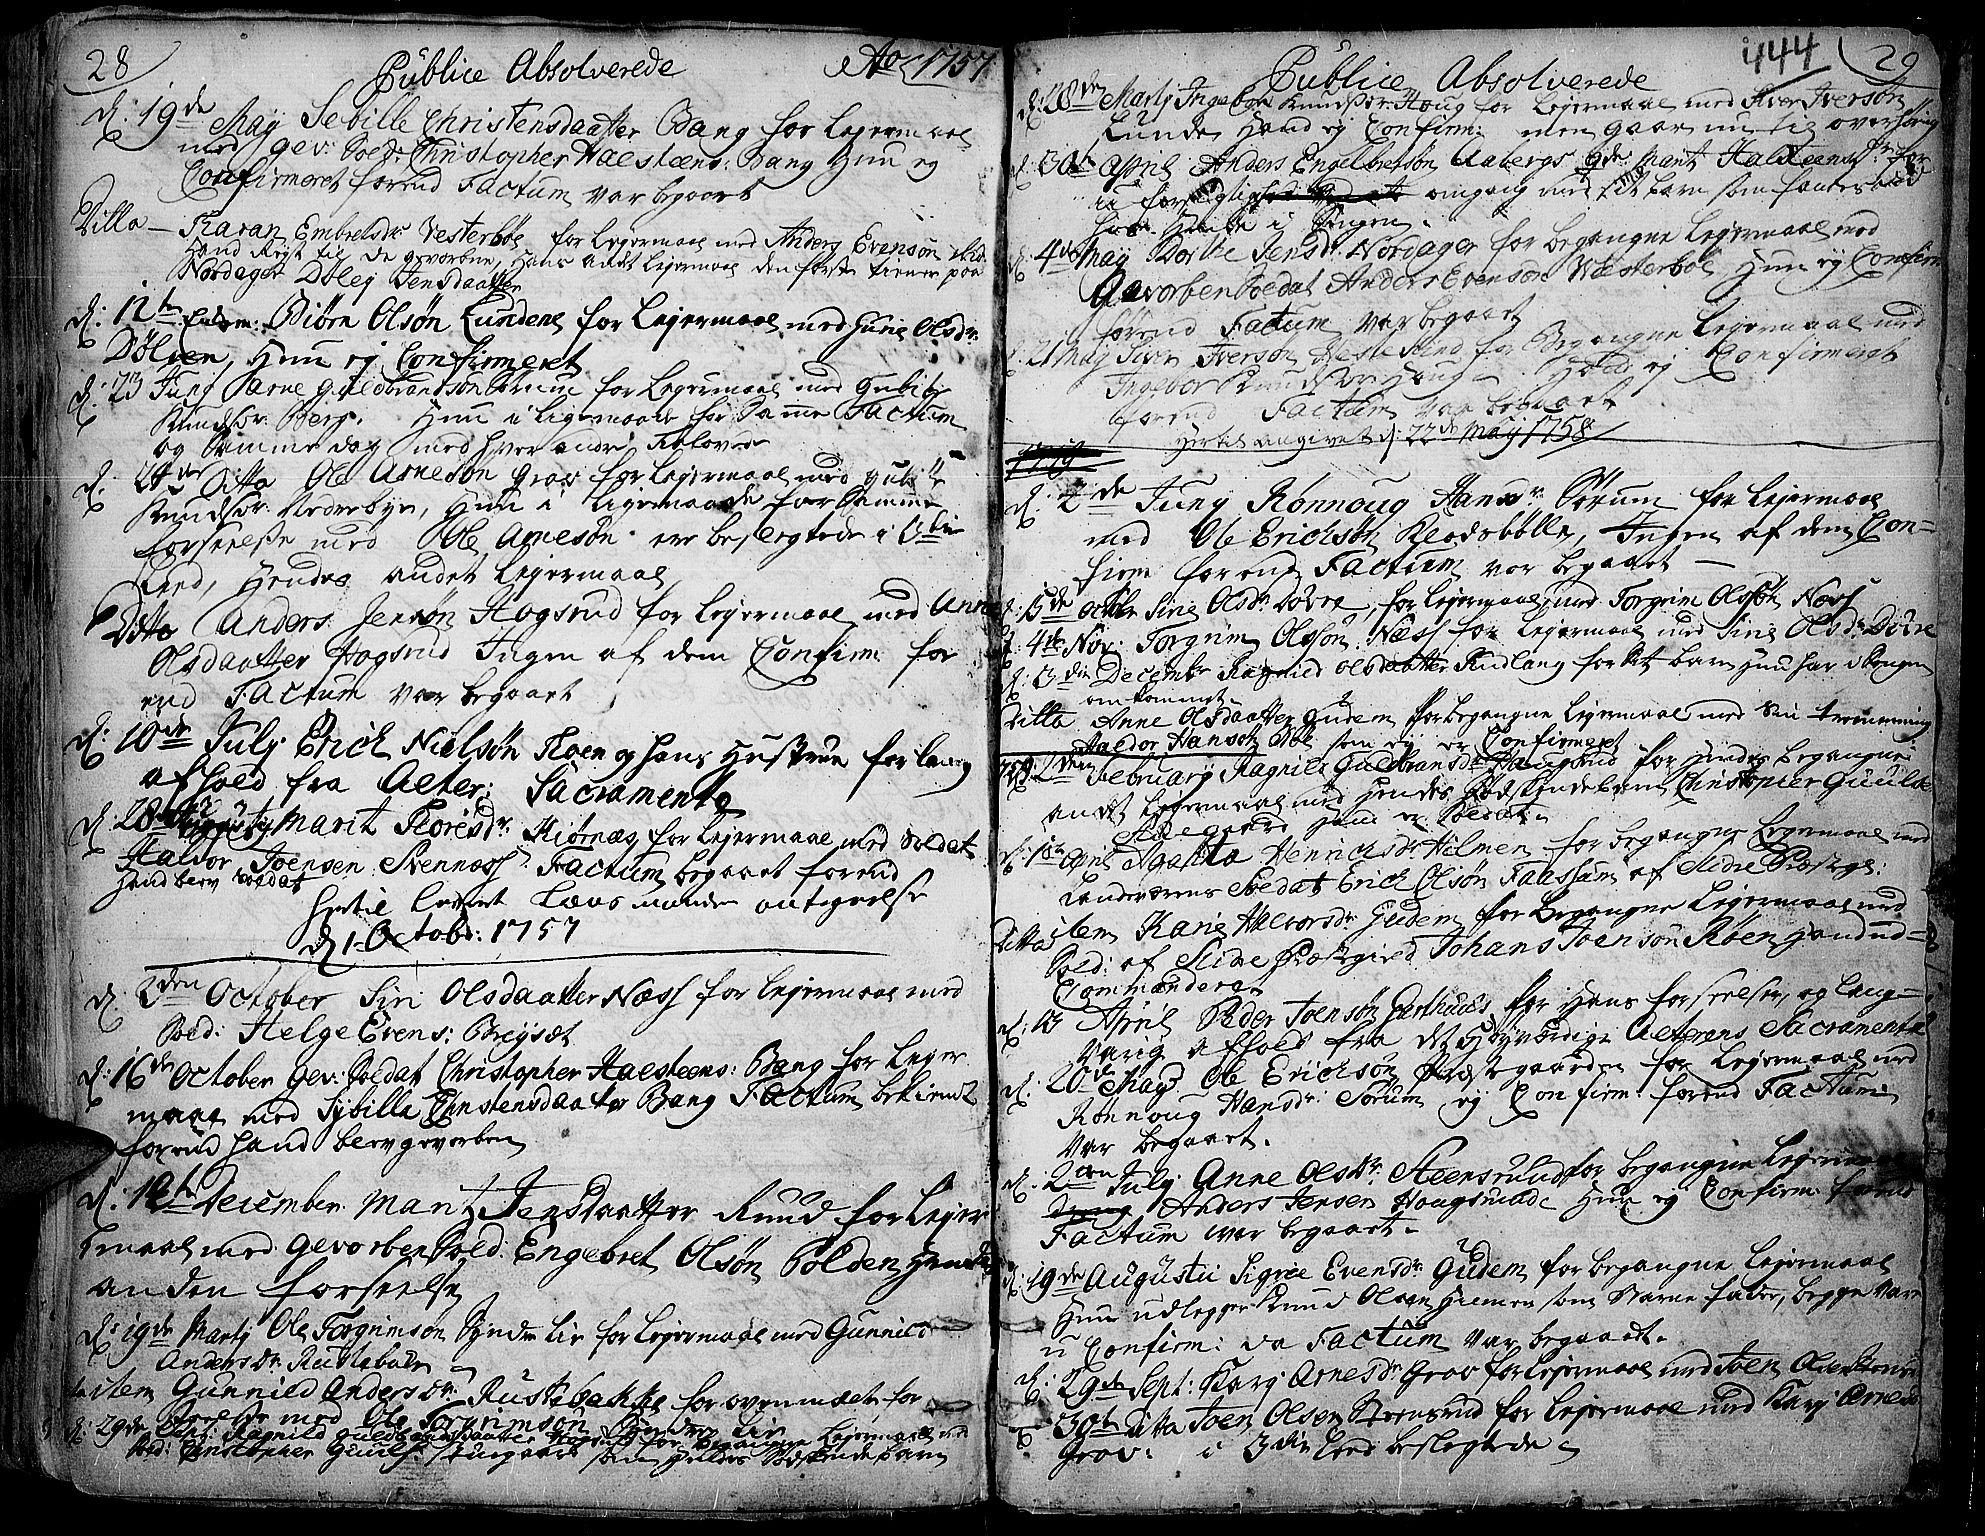 SAH, Aurdal prestekontor, Ministerialbok nr. 4, 1730-1762, s. 28-29